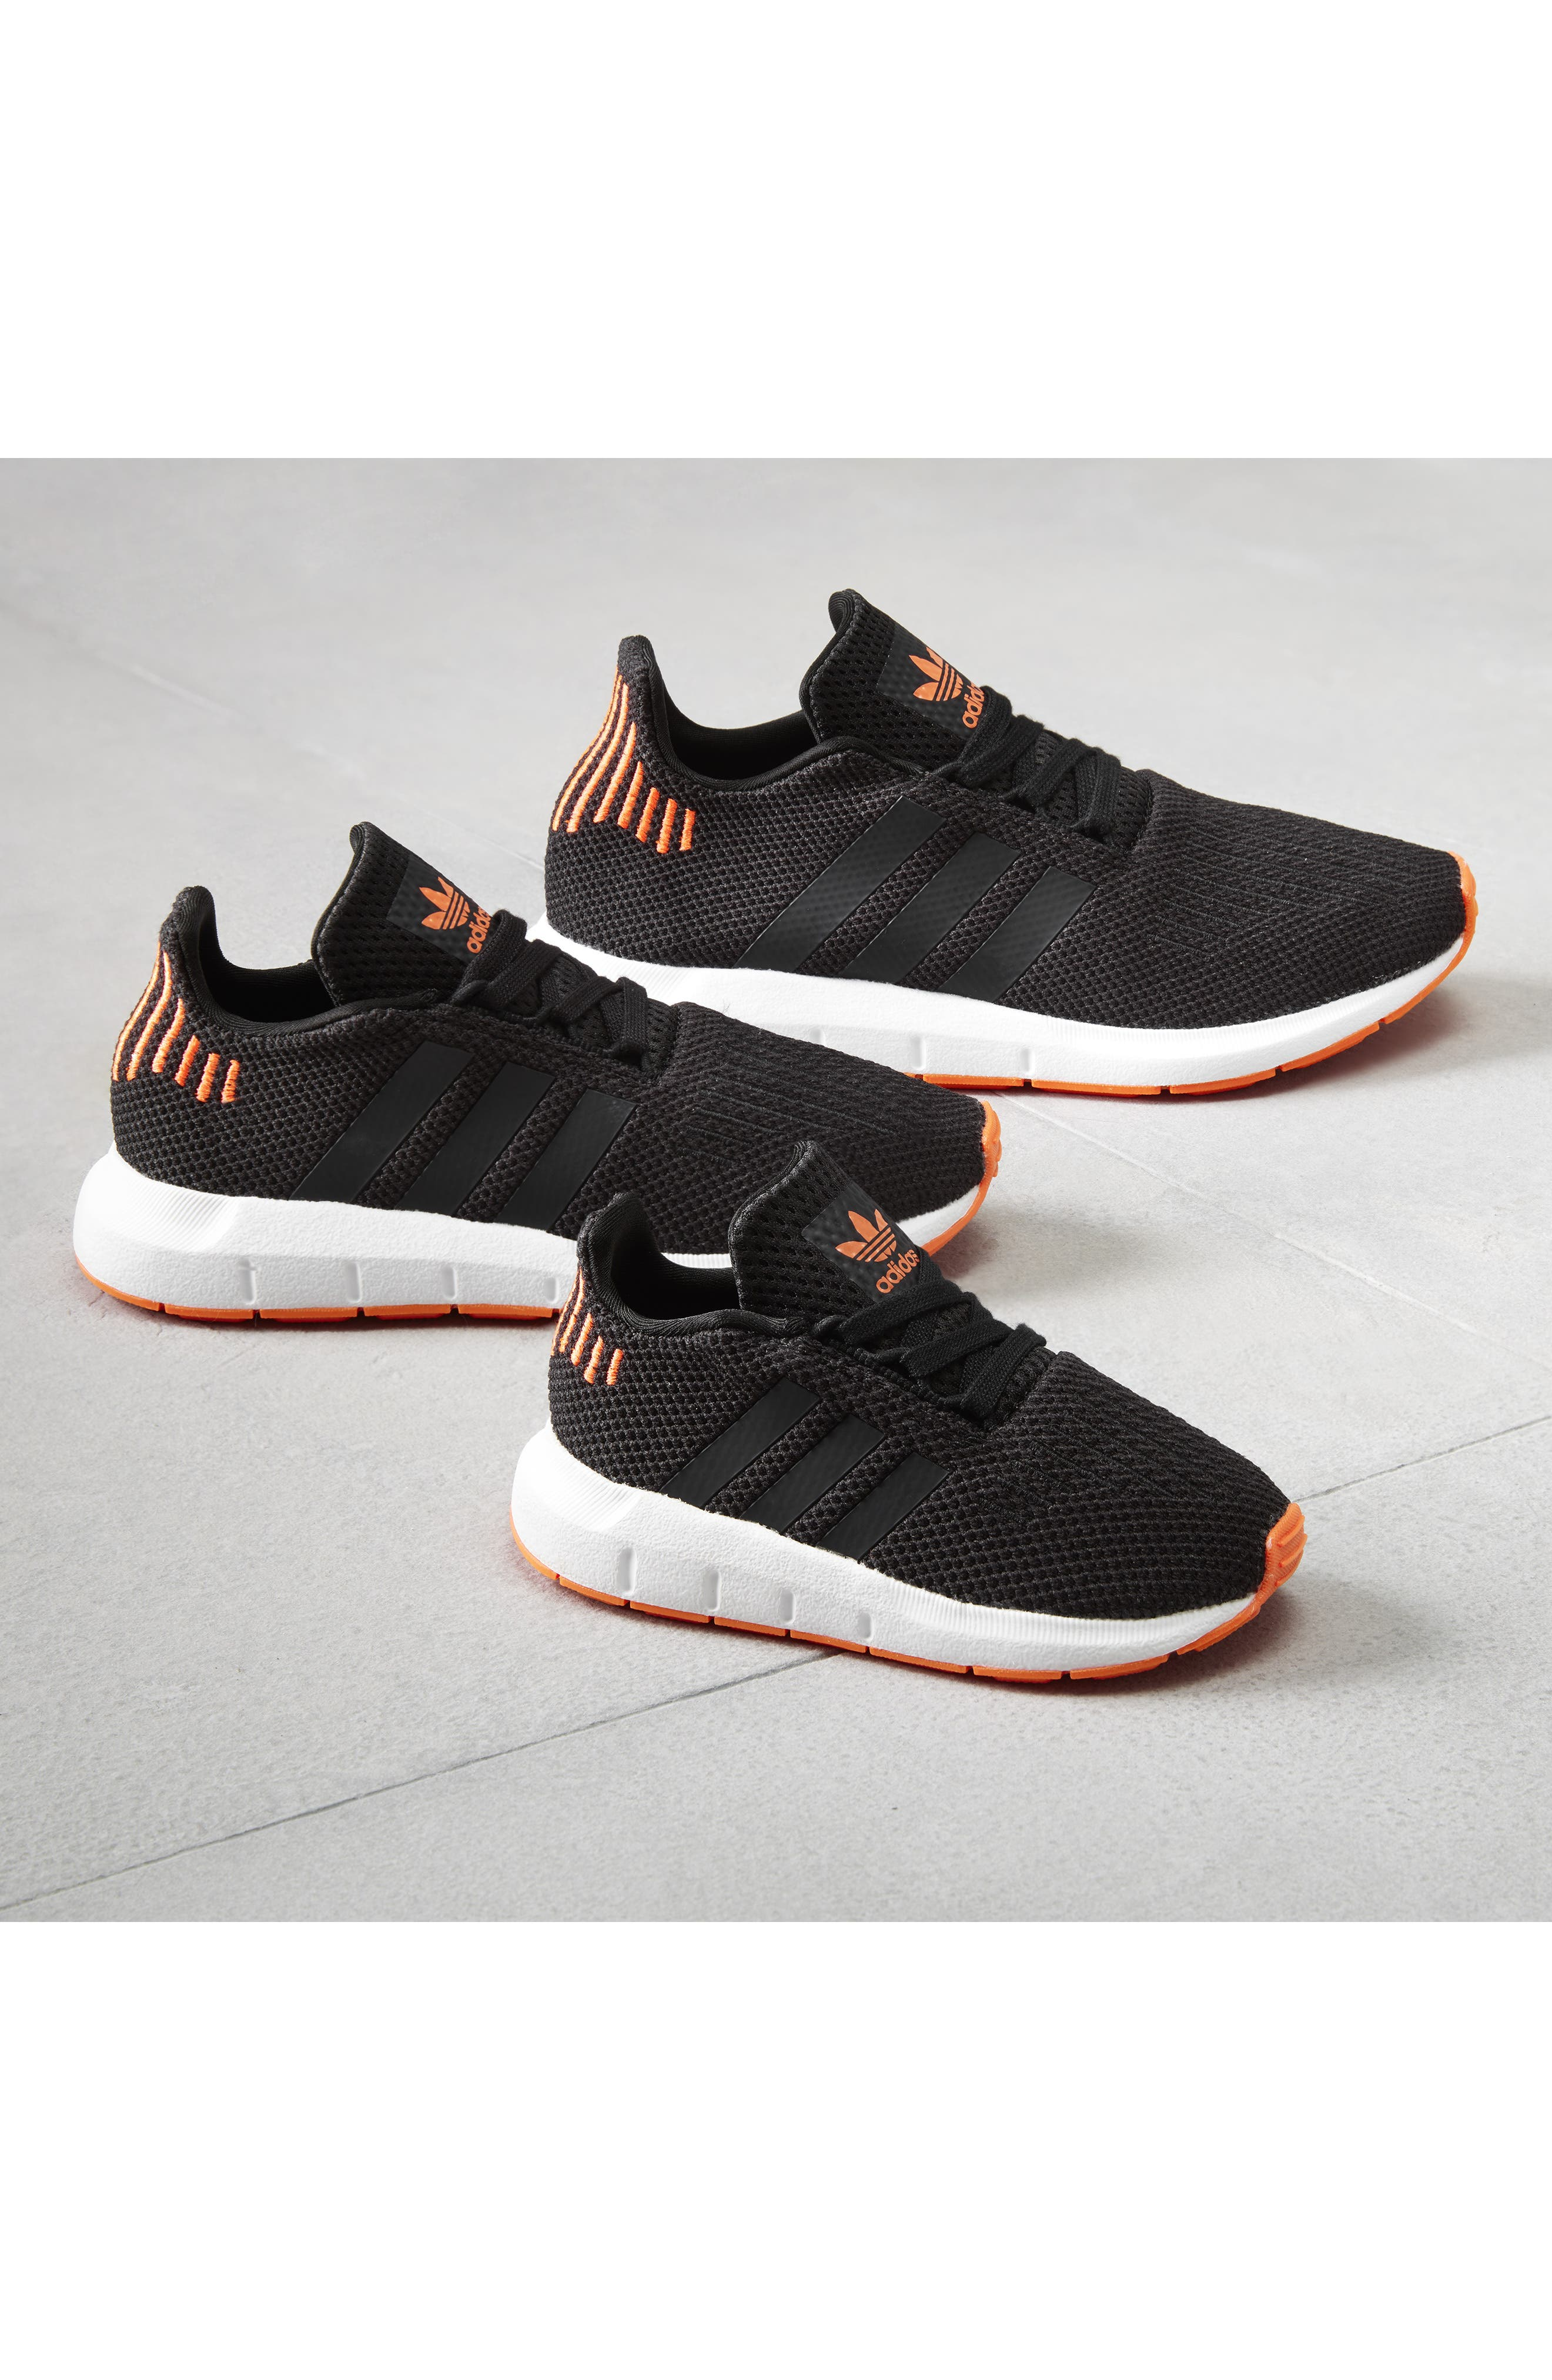 Swift Run J Sneaker,                             Alternate thumbnail 14, color,                             SEMI SOLAR PINK/ WHITE